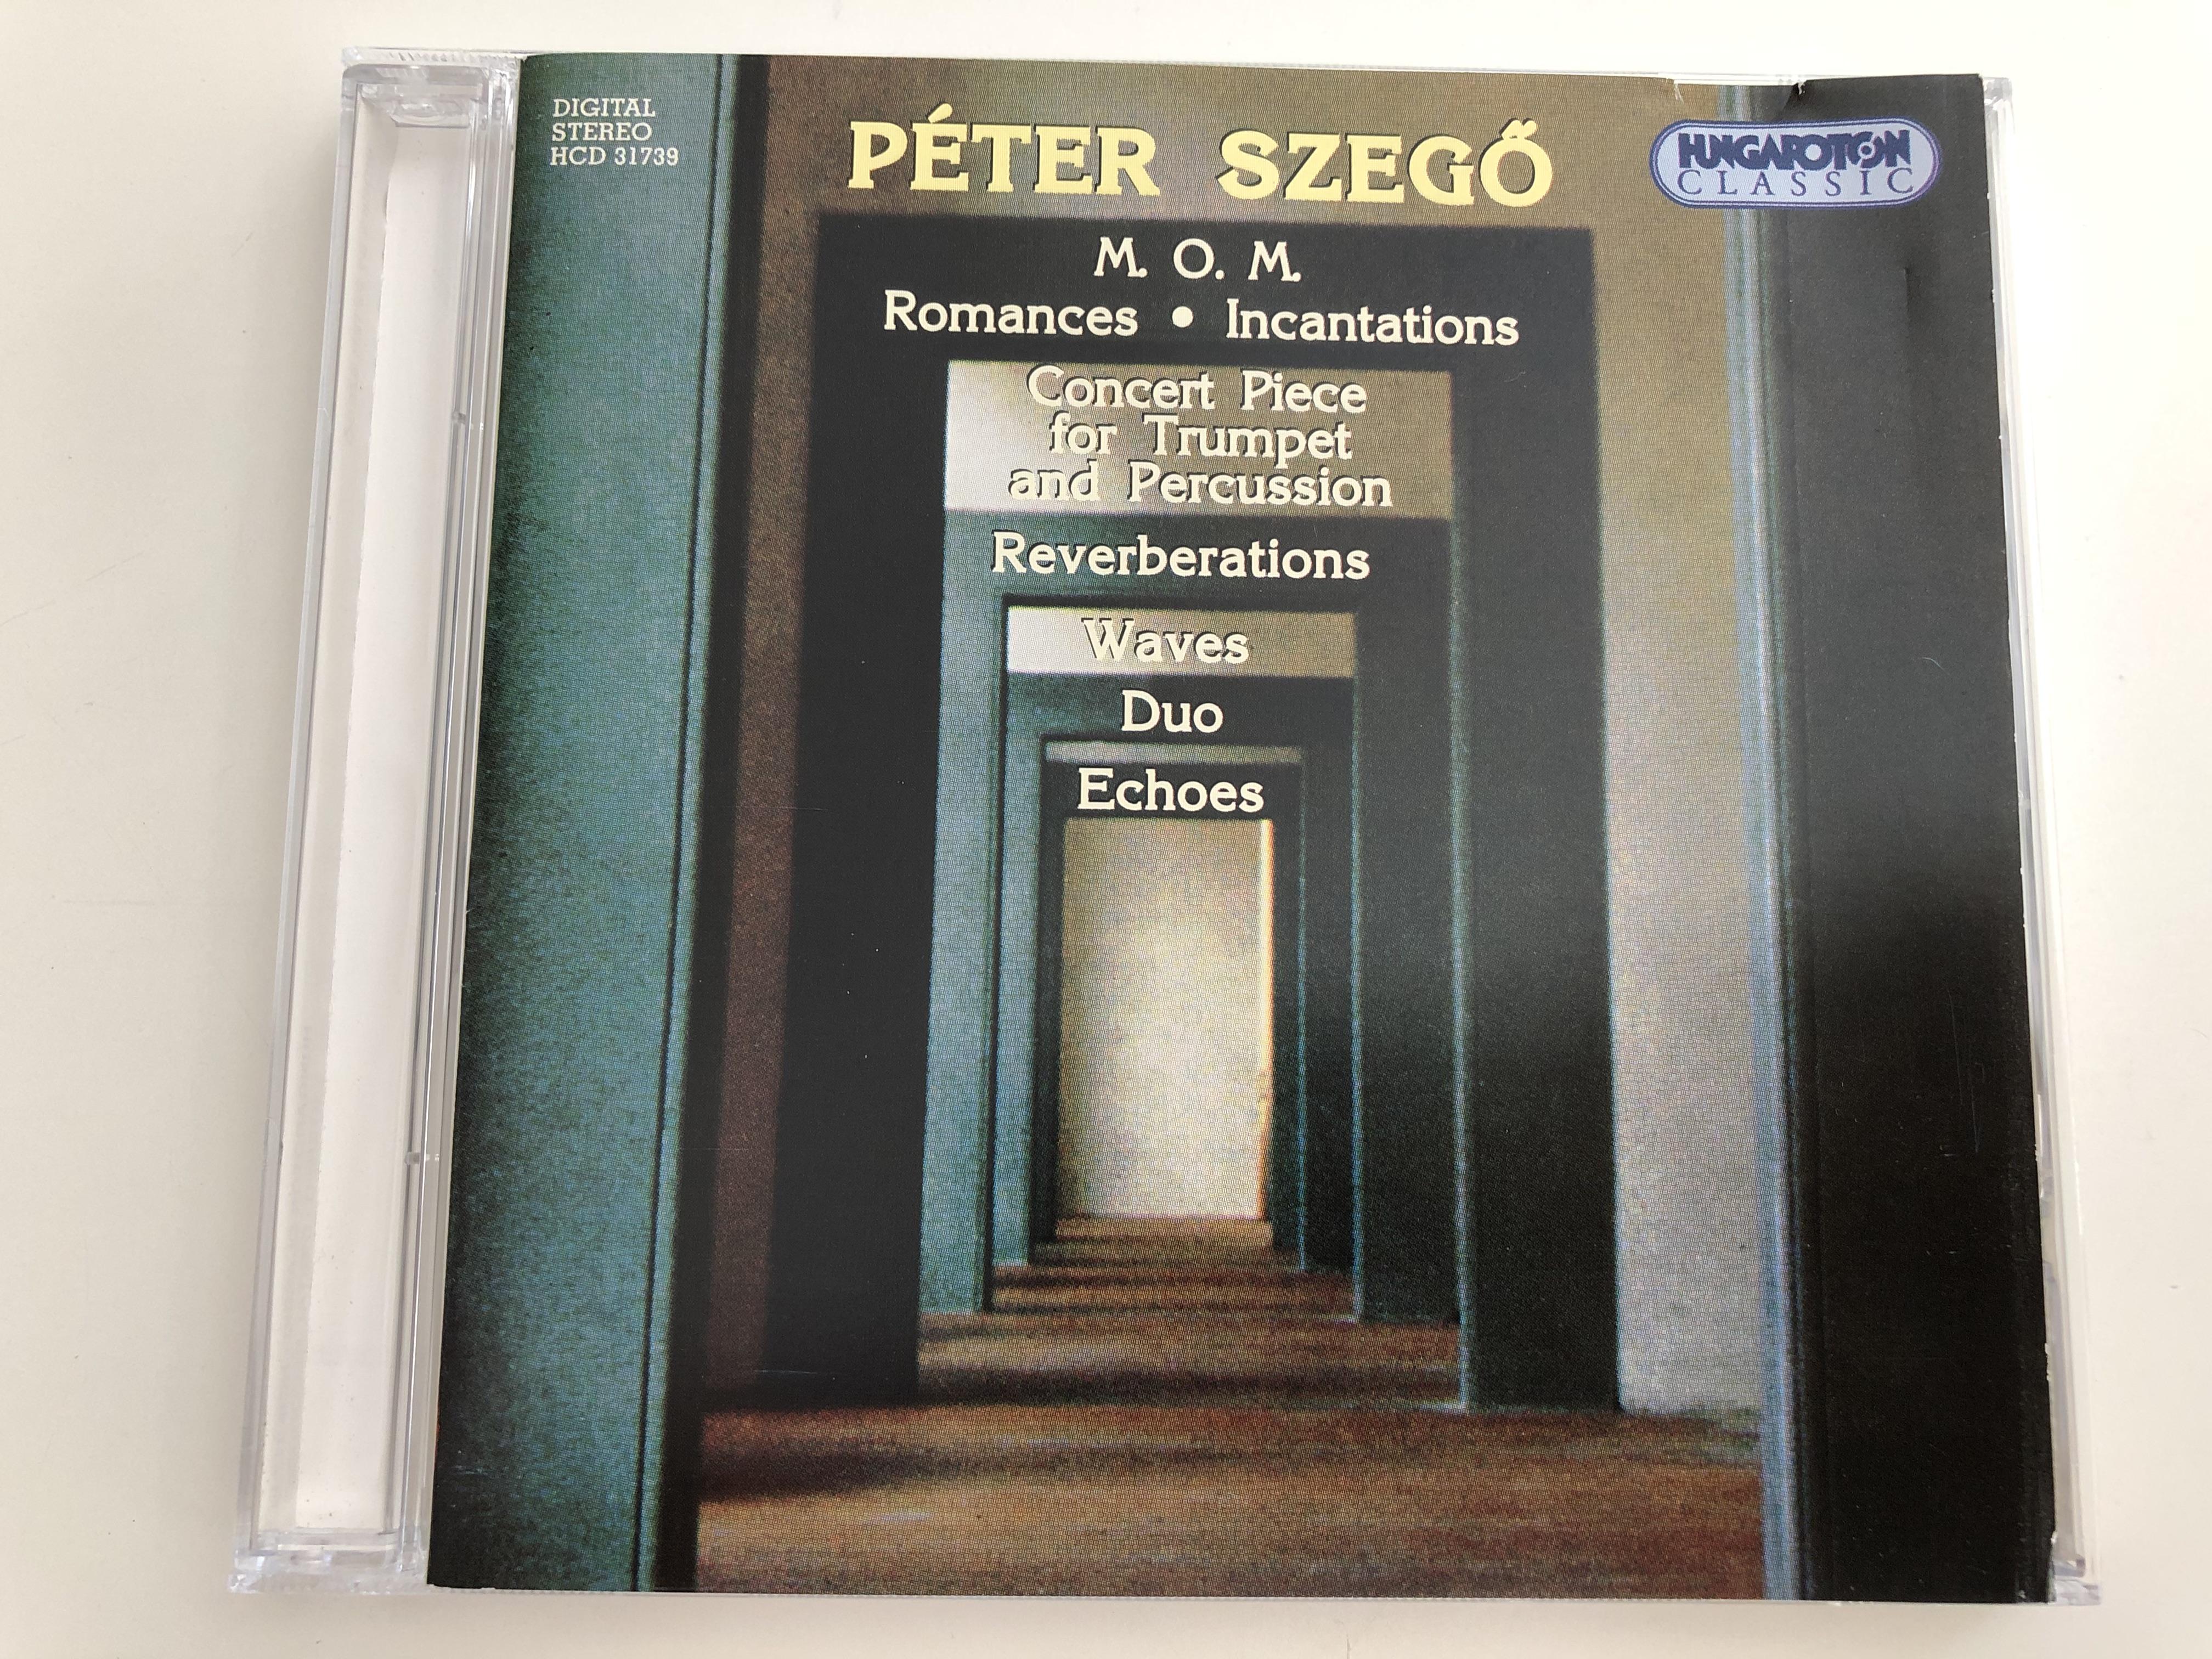 p-ter-szeg-m.o.m-romances-incantations-concert-piece-for-trumpet-and-percussion-reverberations-waves-duo-echoes-hungaroton-classic-audio-cd-1997-hcd-31739-1-.jpg